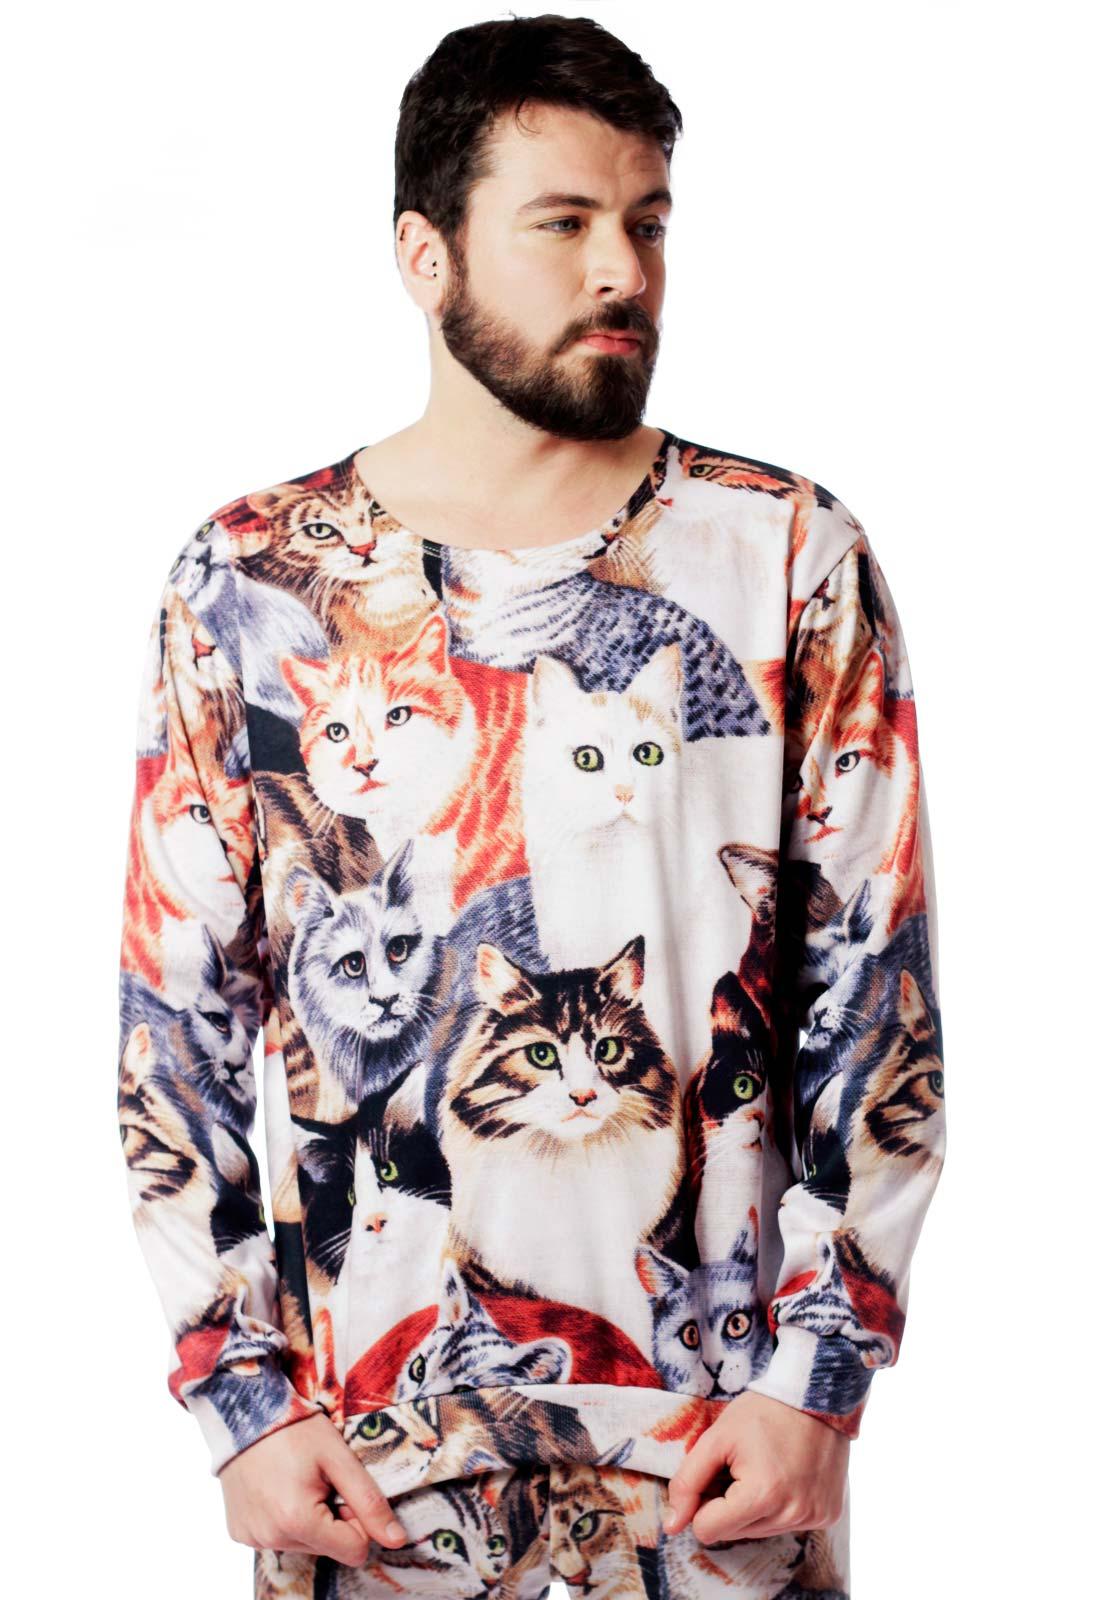 Blusa Moletom Tumblr Estampado ElephunK Full Print Unissex Gatíneos